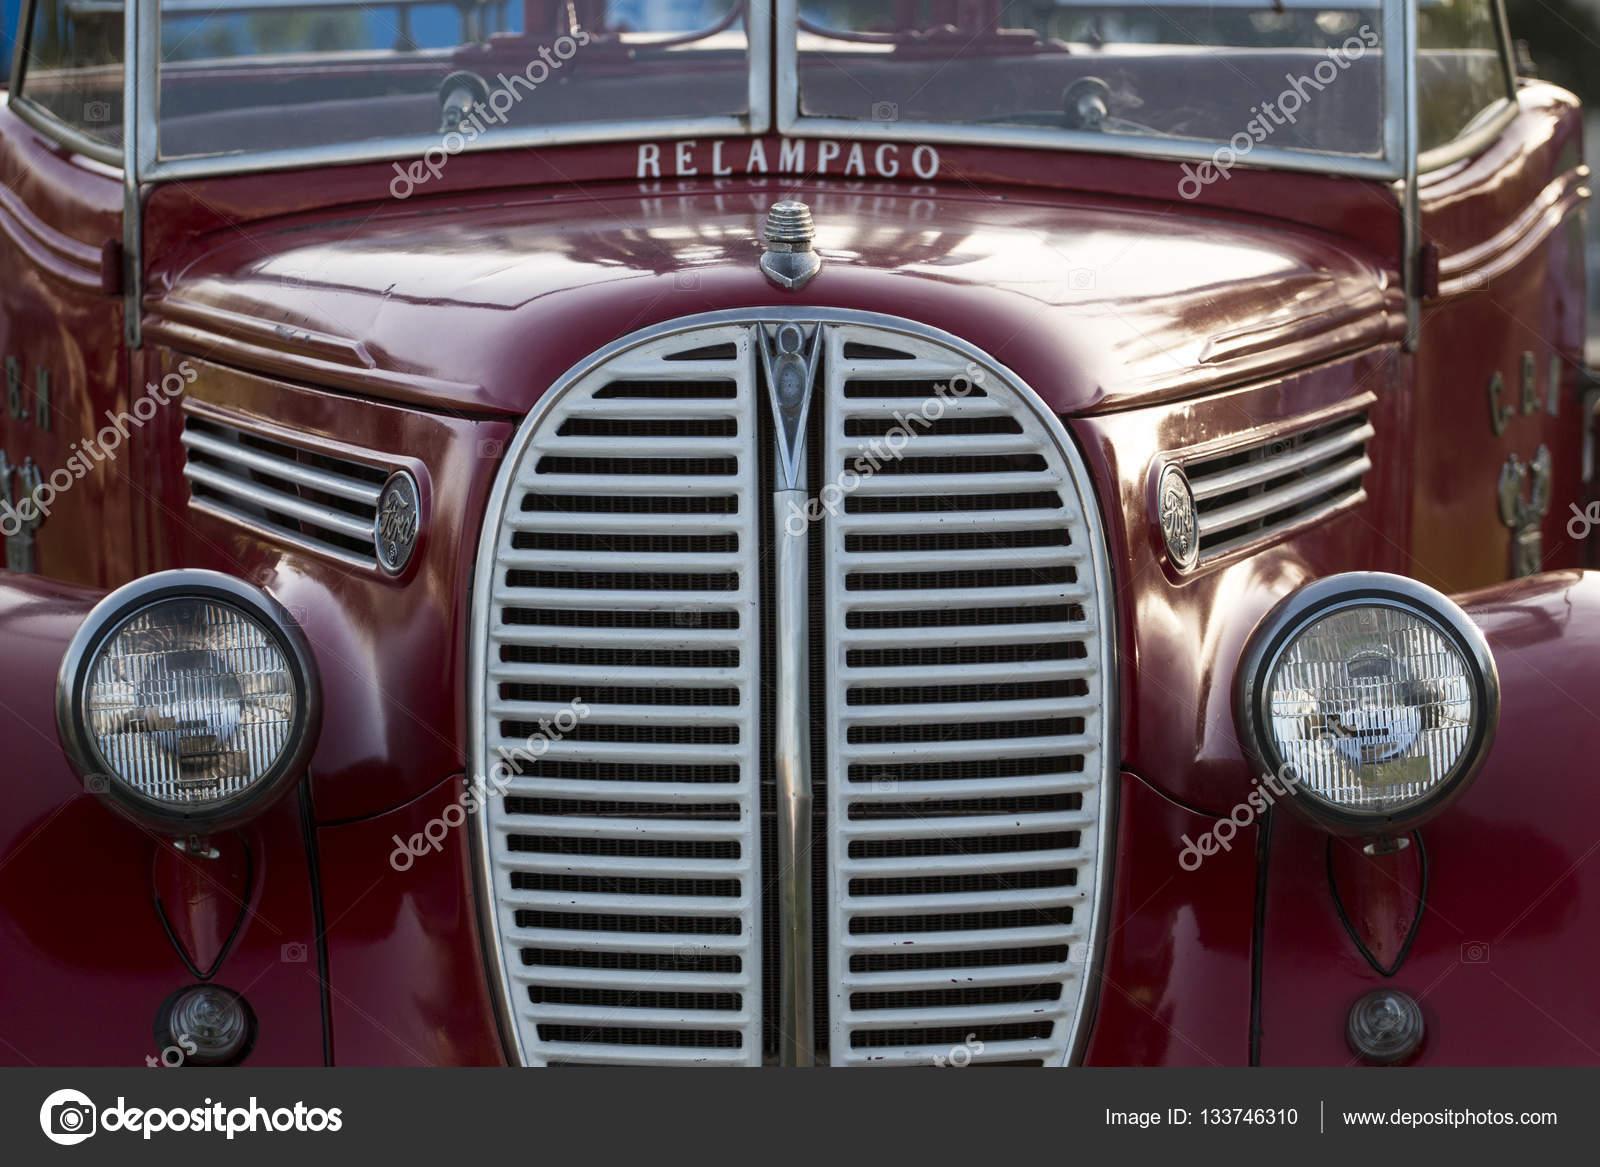 Veiculos Classicos Exposicao Fotografia De Stock Editorial C Membio 133746310